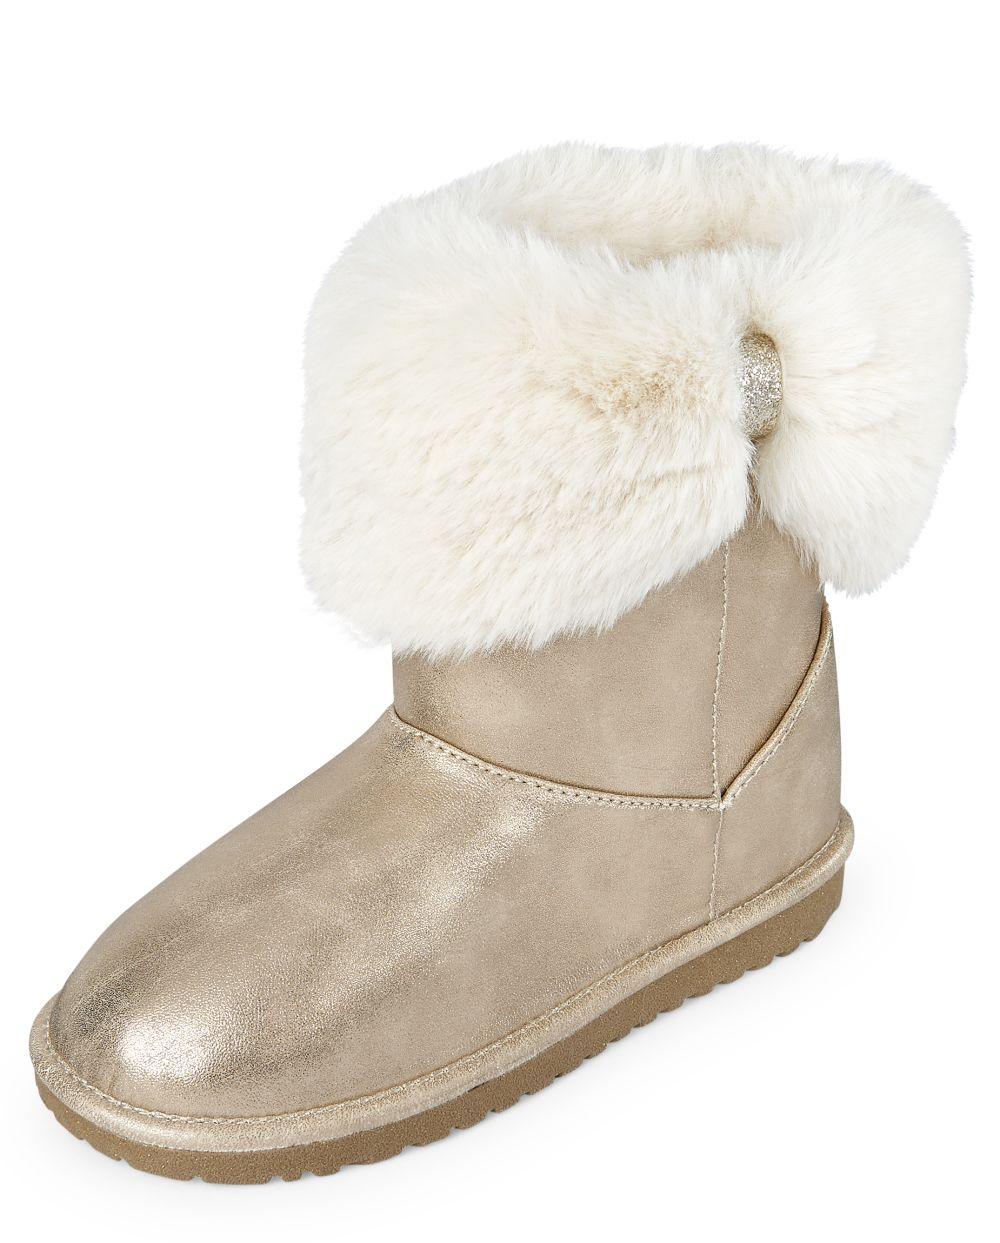 Girls Metallic Faux Fur Bow Boots